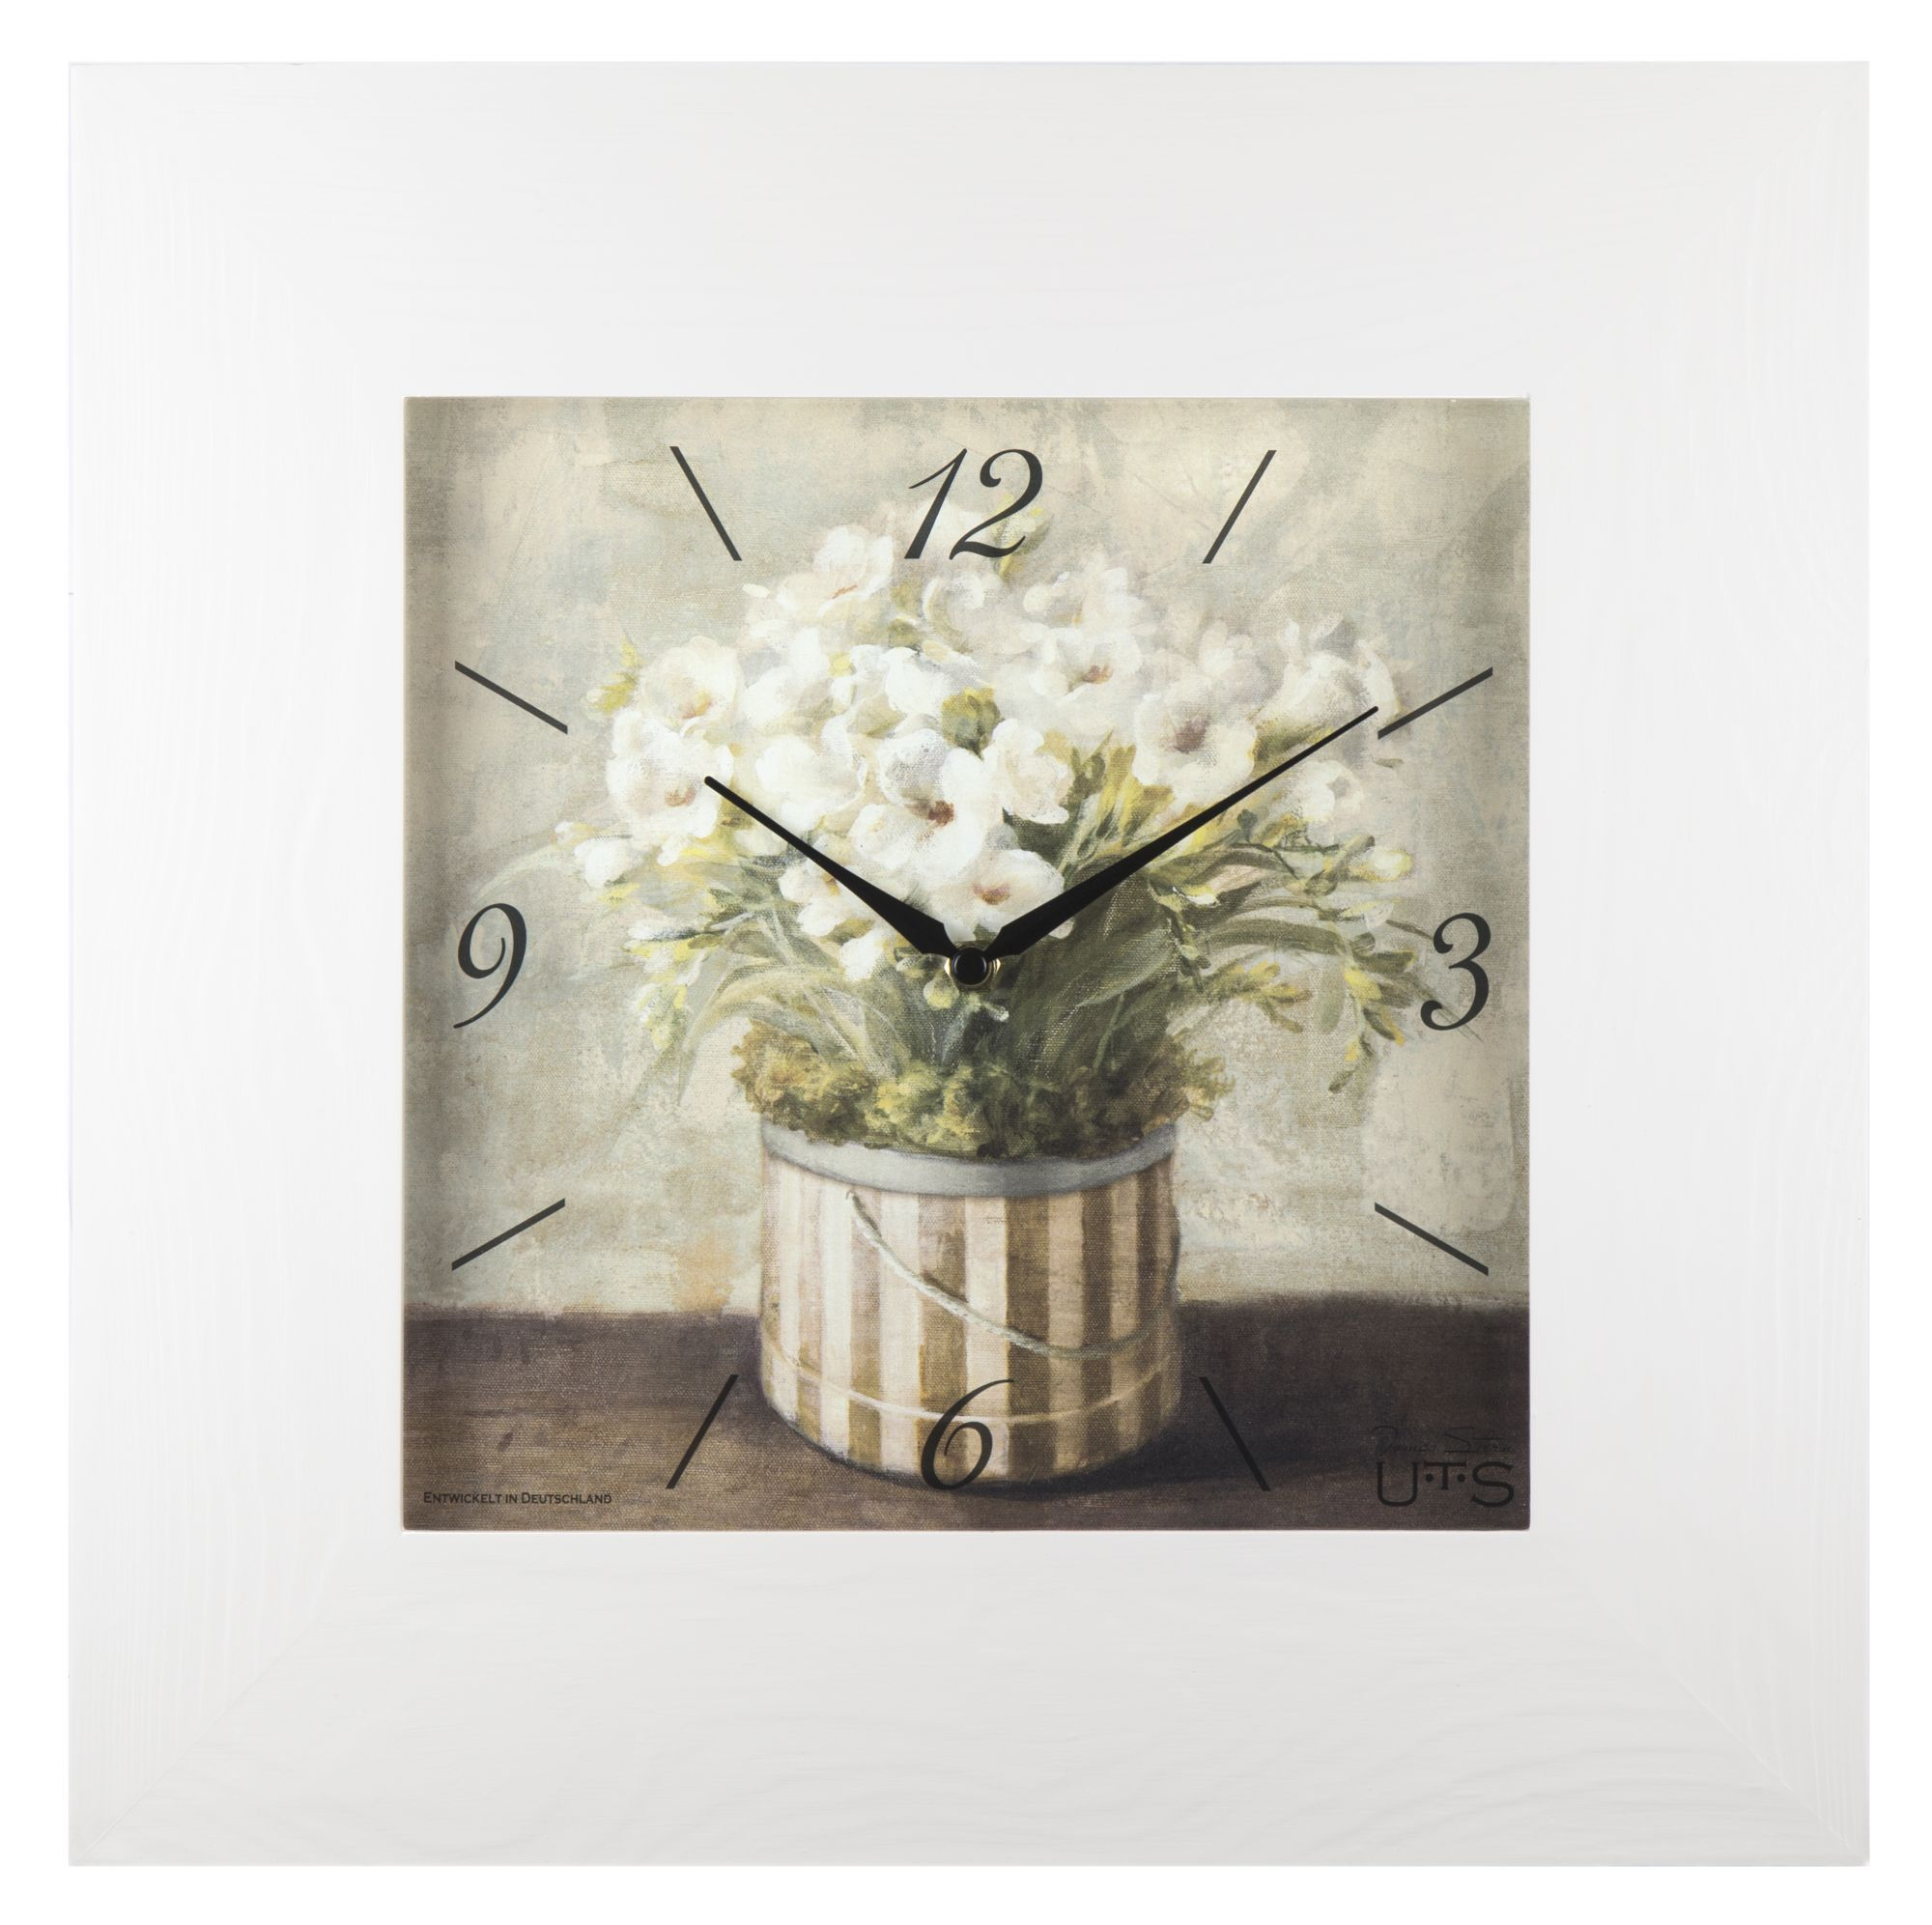 Часы настенные Часы настенные Tomas Stern 7002W chasy-nastennye-tomas-stern-7002w-germaniya-tayvan.jpg